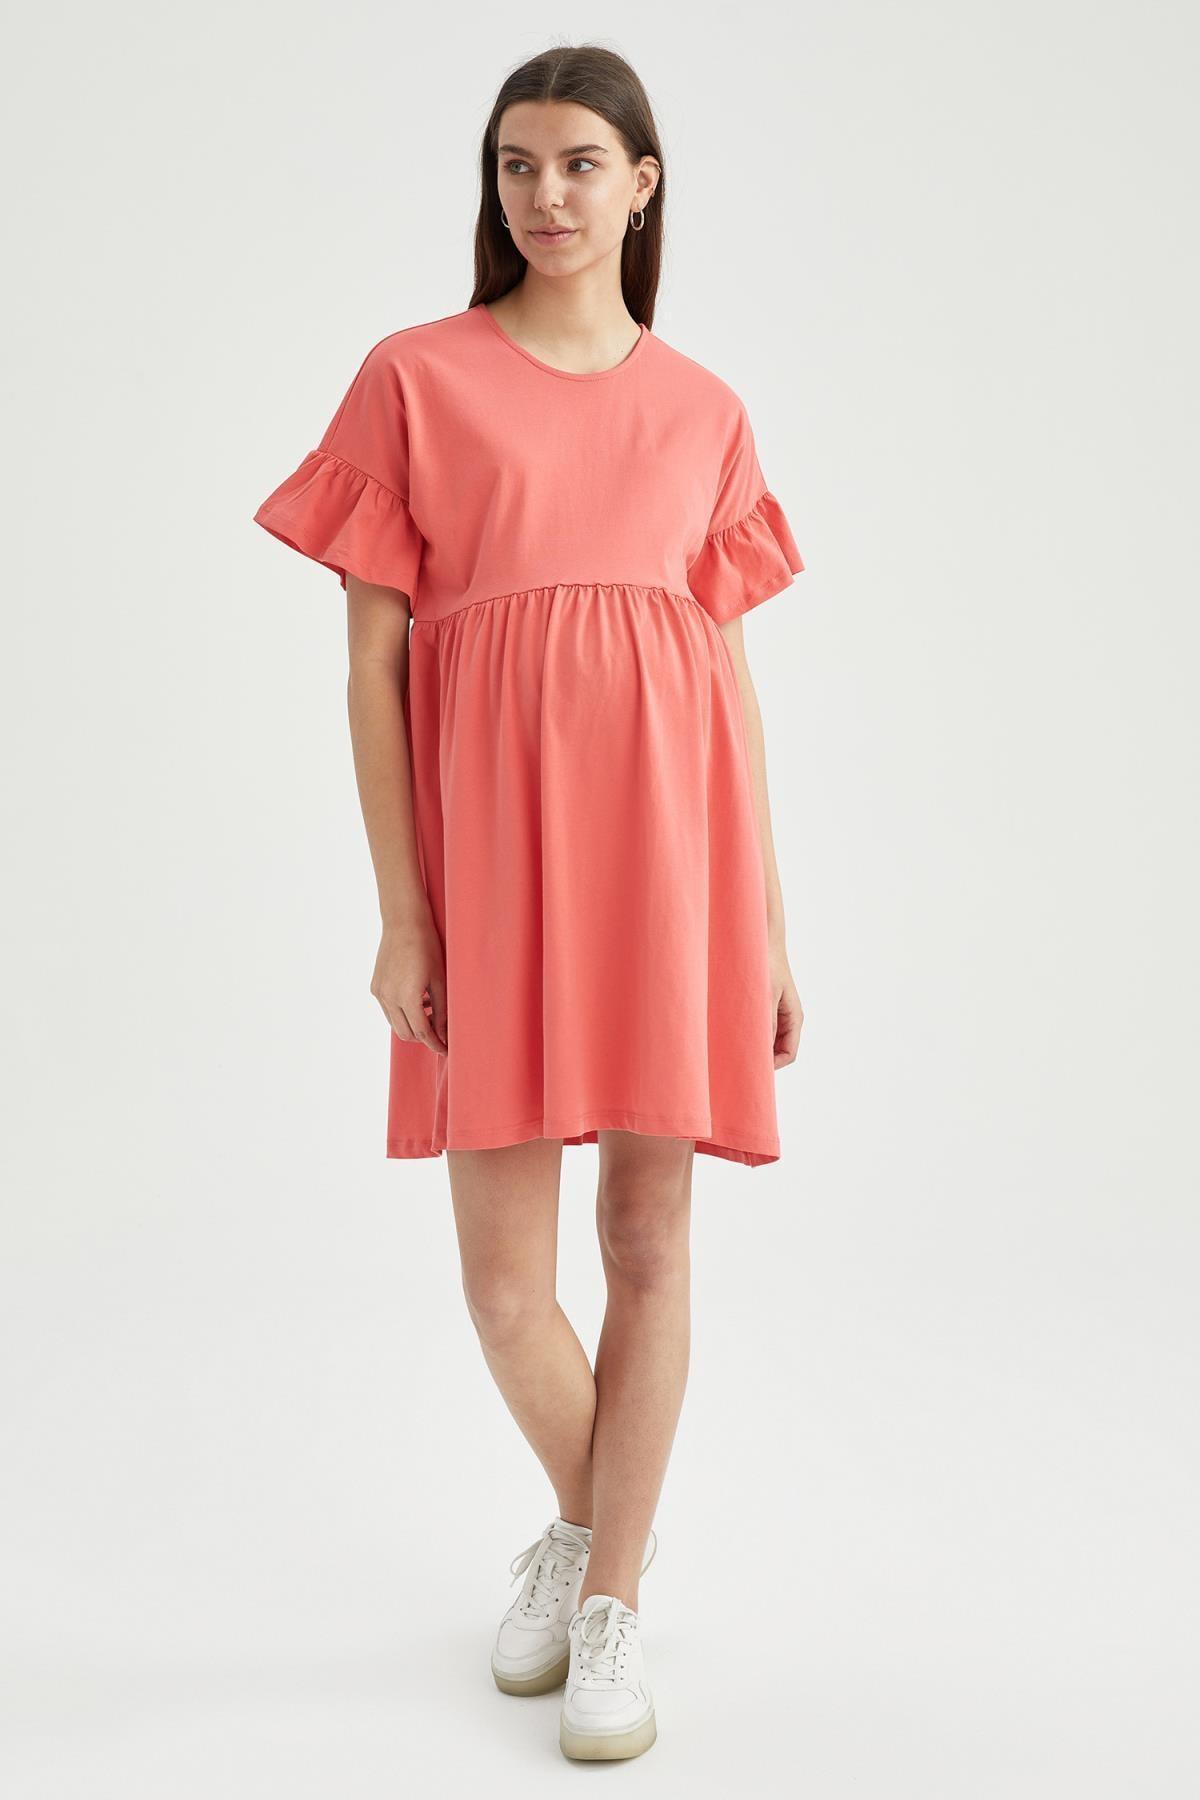 DeFacto Oversize Fit Volan Detaylı Kısa Kollu Hamile Elbisesi